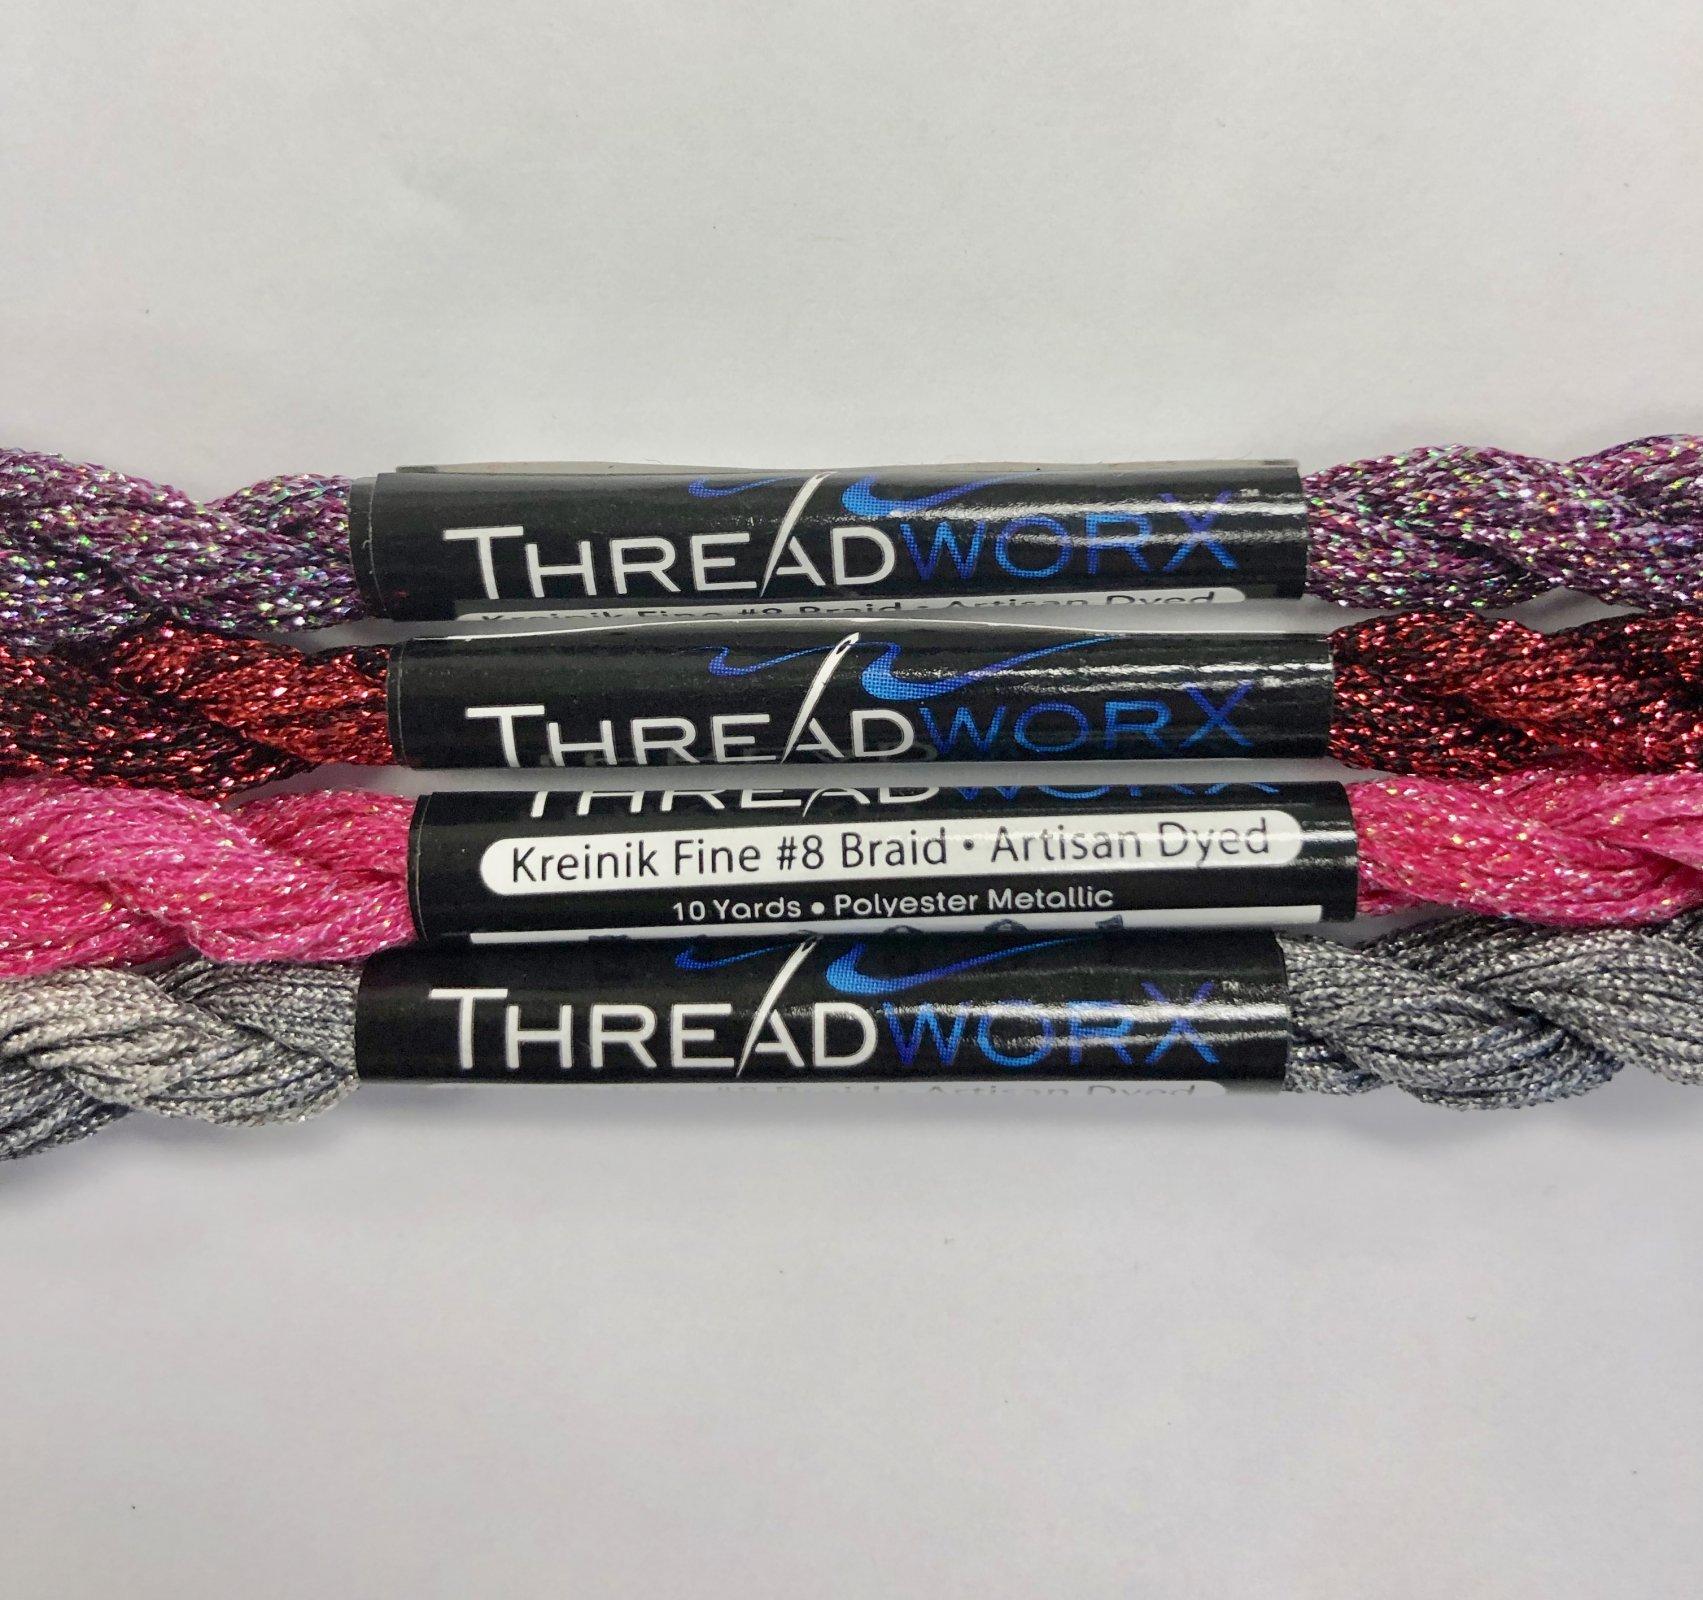 threadworX overdyed kreinik #8